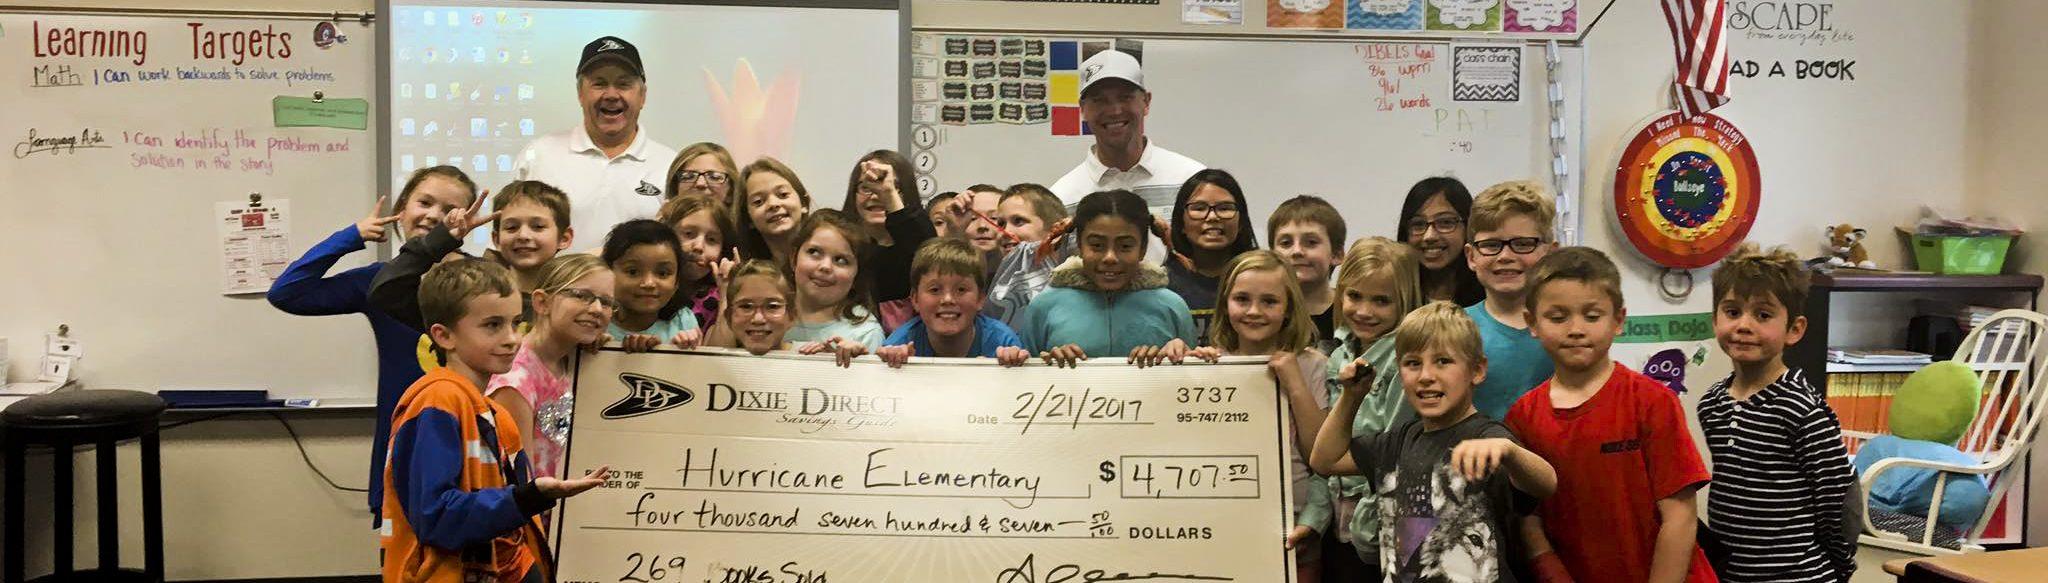 Dixie Direct Elementary School Fundraising St George Utah